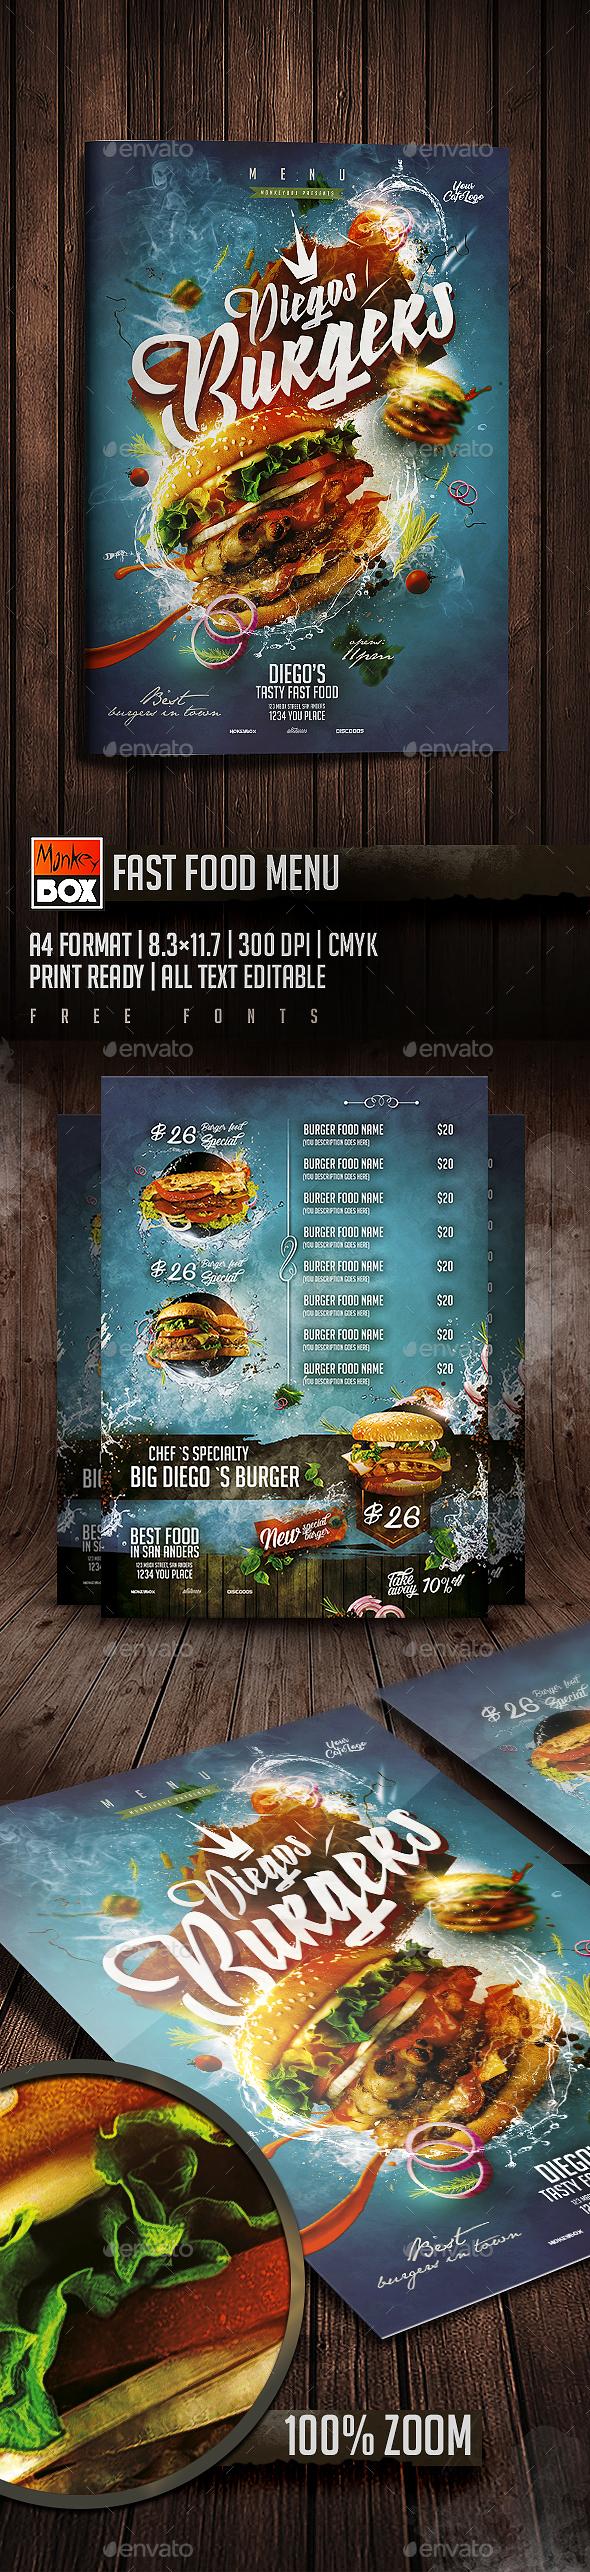 Fast Food Menu - Food Menus Print Templates